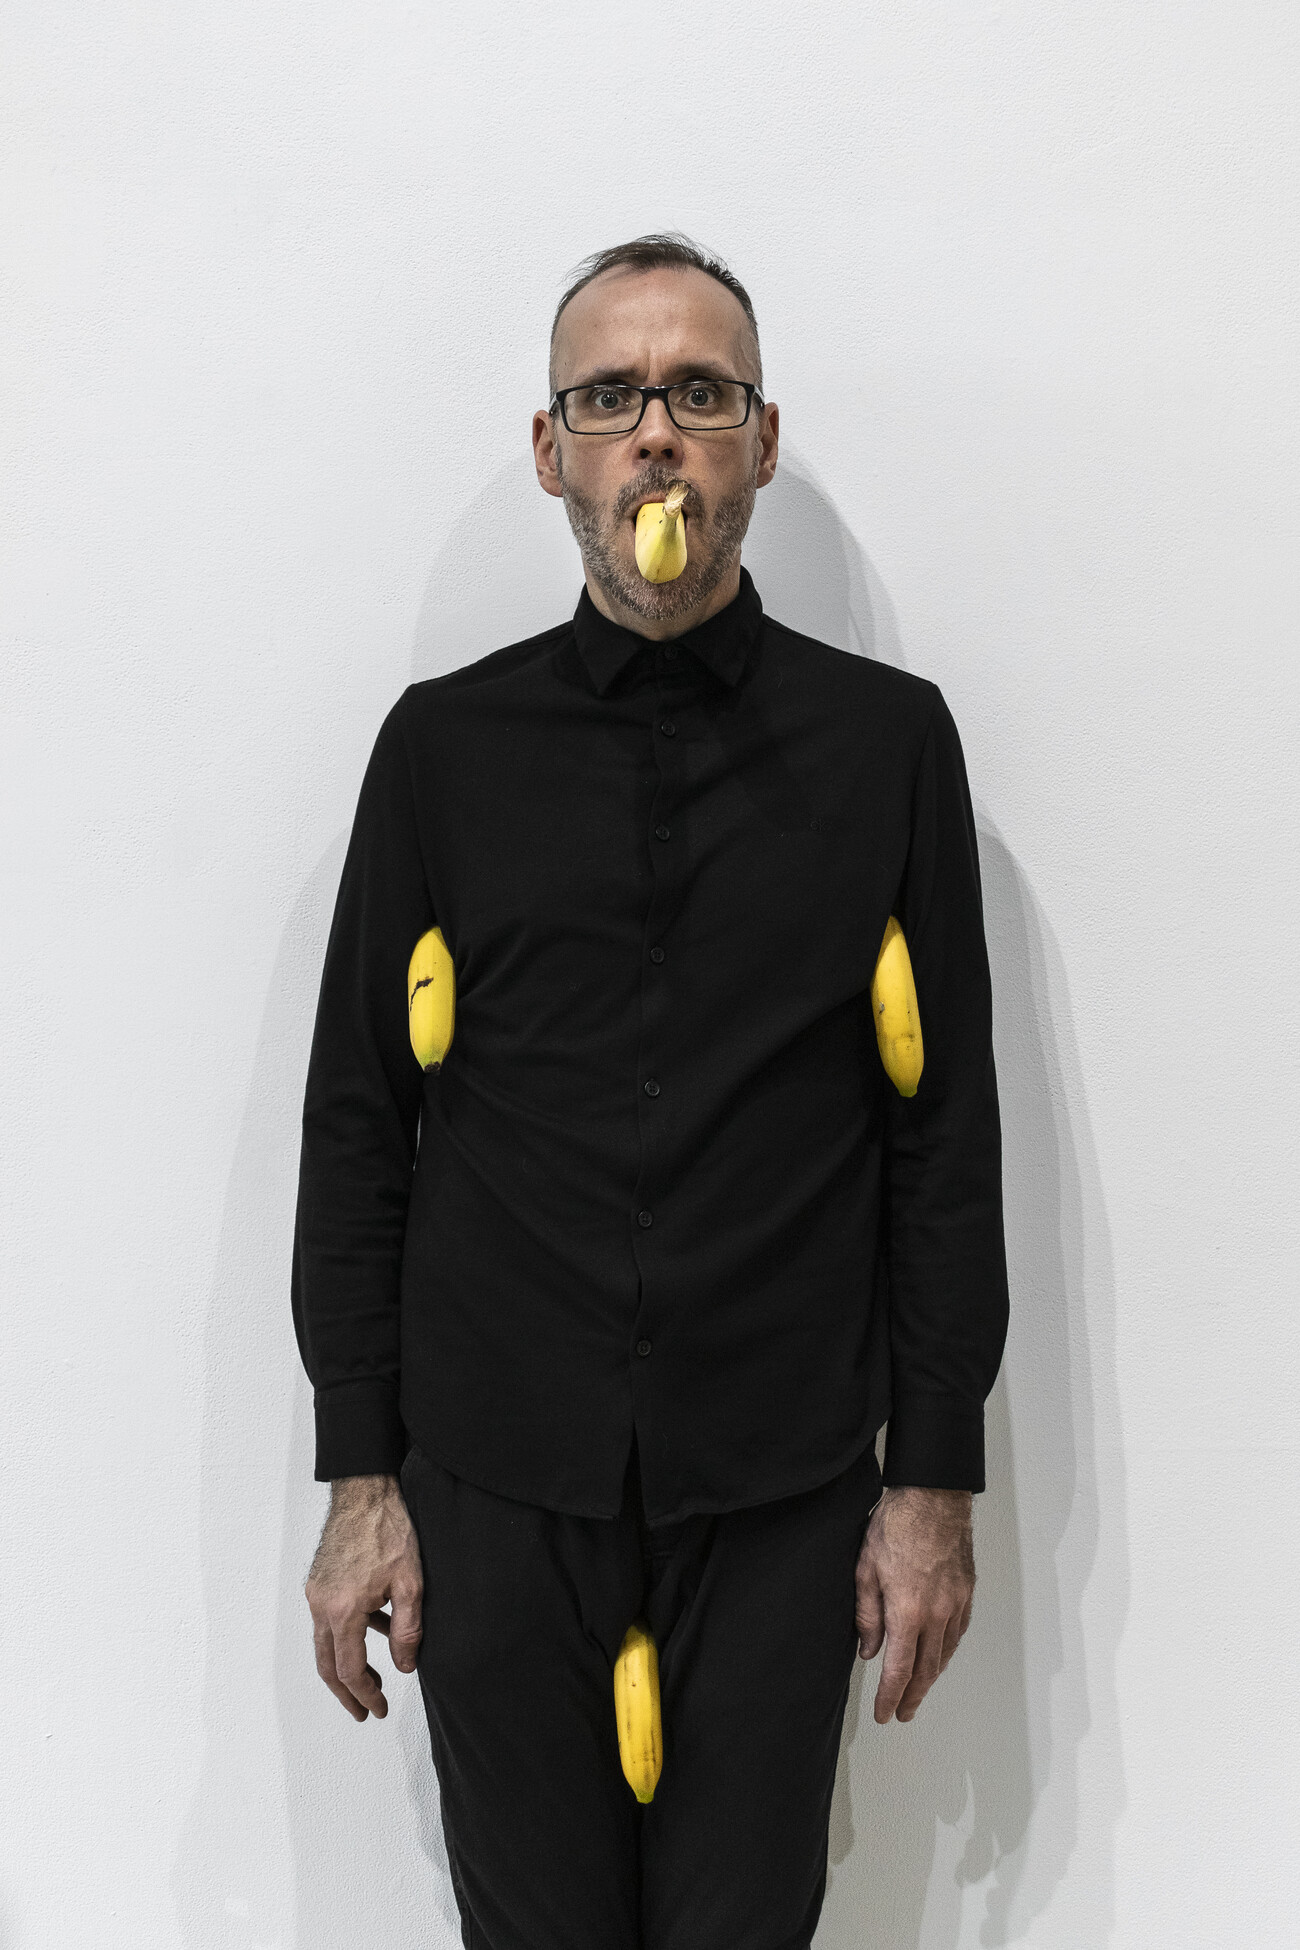 Steve Giasson. Performance invisible n° 173 (S'exhiber encore). Reenactment de Erwin Wurm. Untitled (4 bananas). 1999. Performeur : Steve Giasson. Crédit photographique : Martin Vinette. AXENÉO7, Gatineau. 5 novembre 2019.